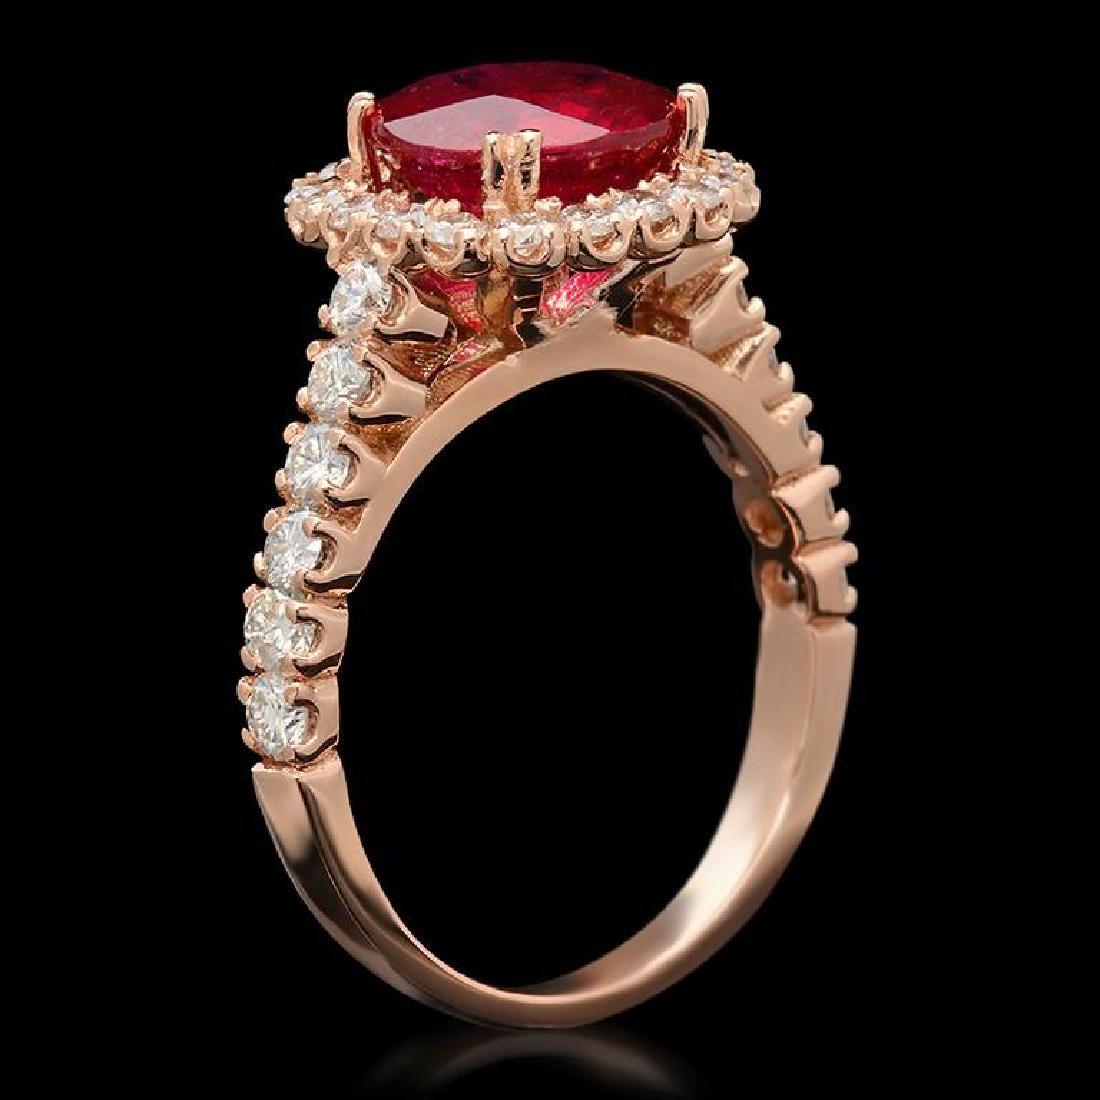 14K Gold 3.28ct Ruby 1.26ct Diamond Ring - 2